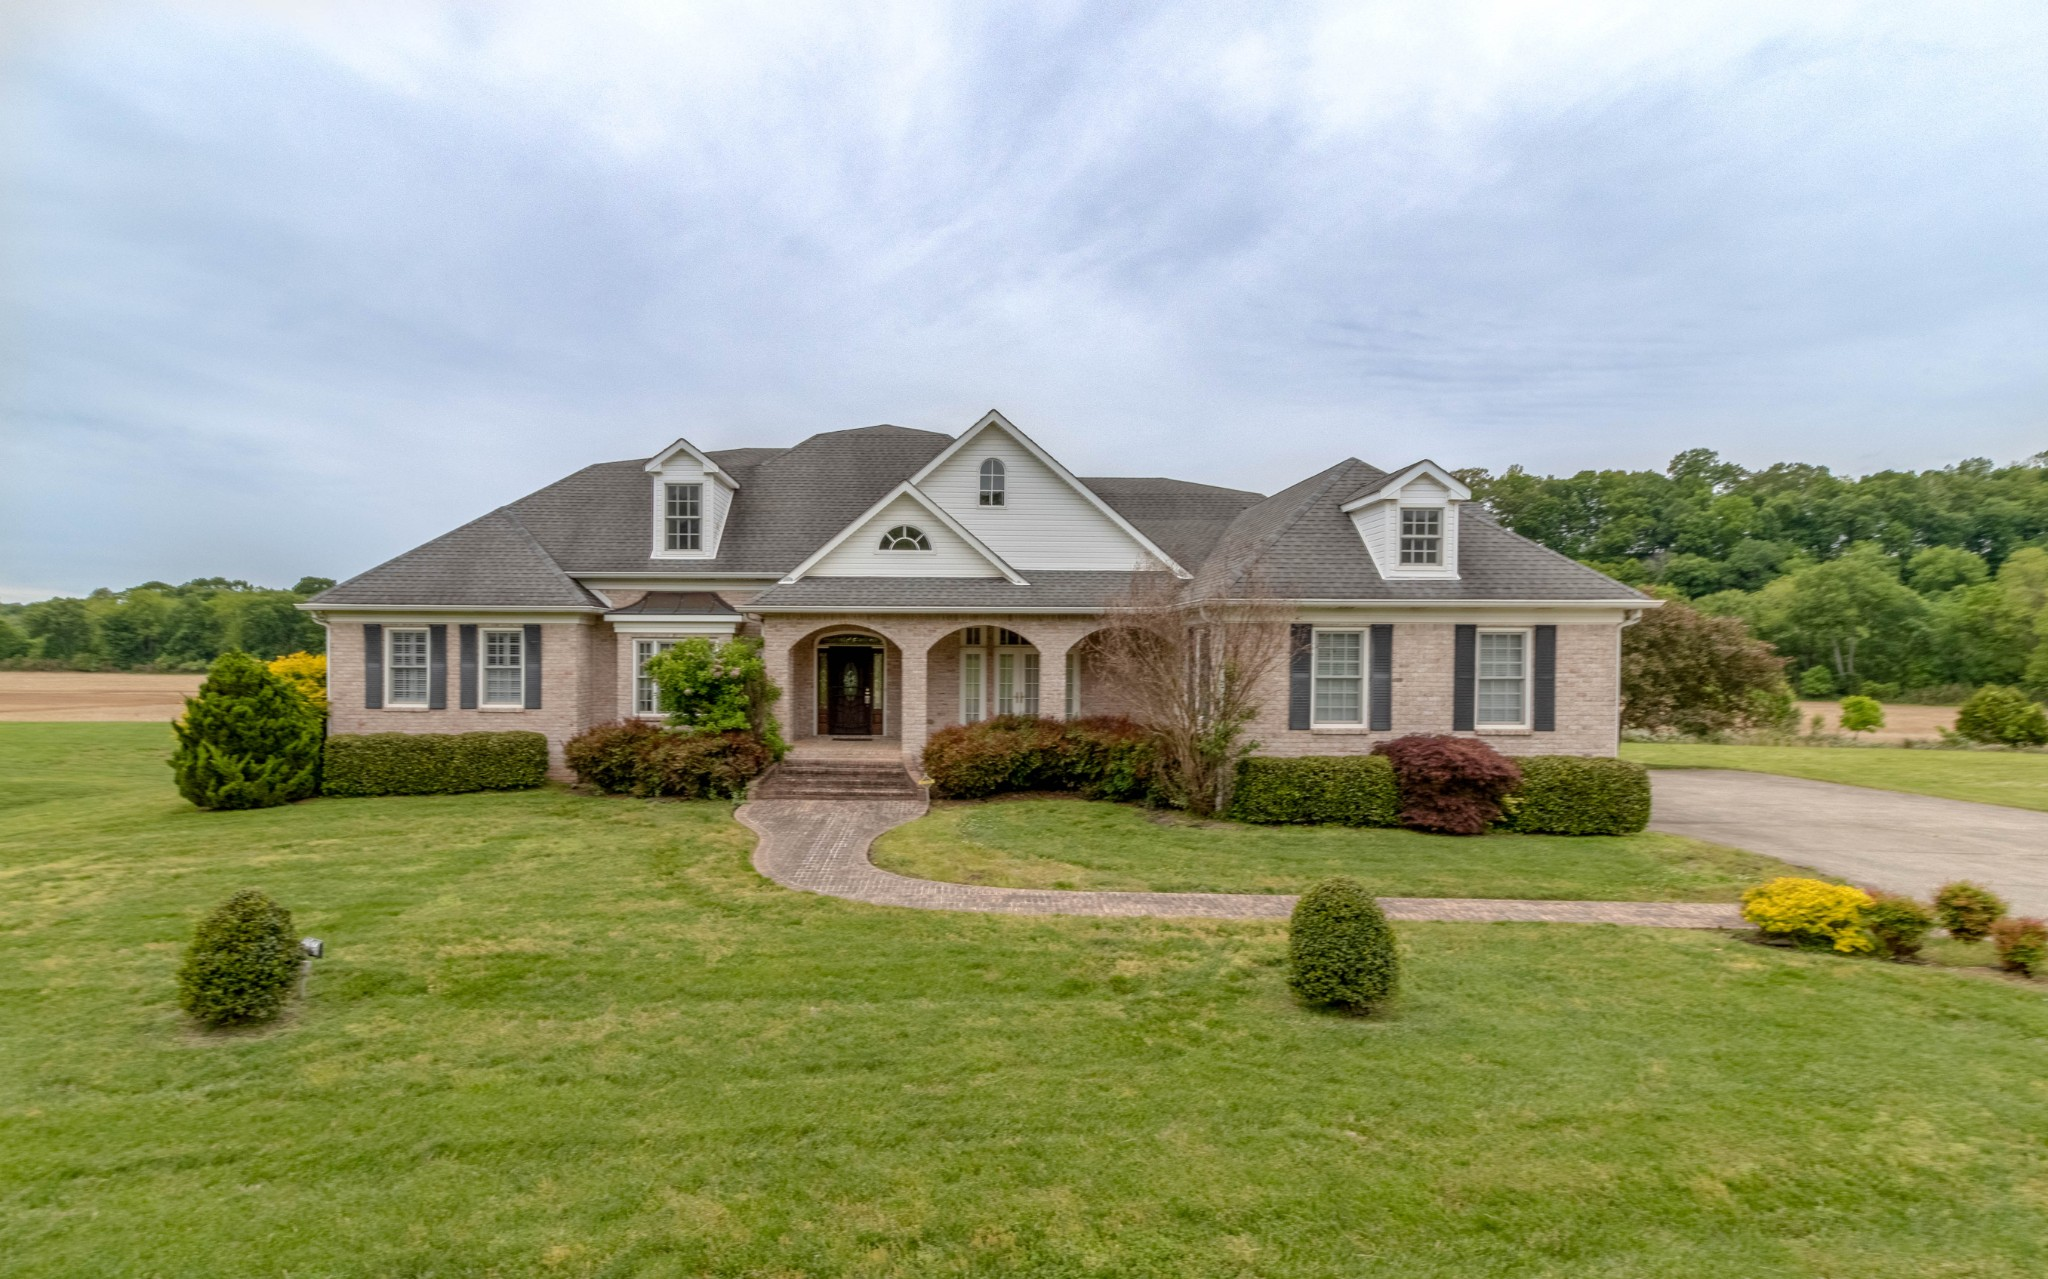 563 POND APPLE ROAD, Clarksville, TN 37043 - Clarksville, TN real estate listing